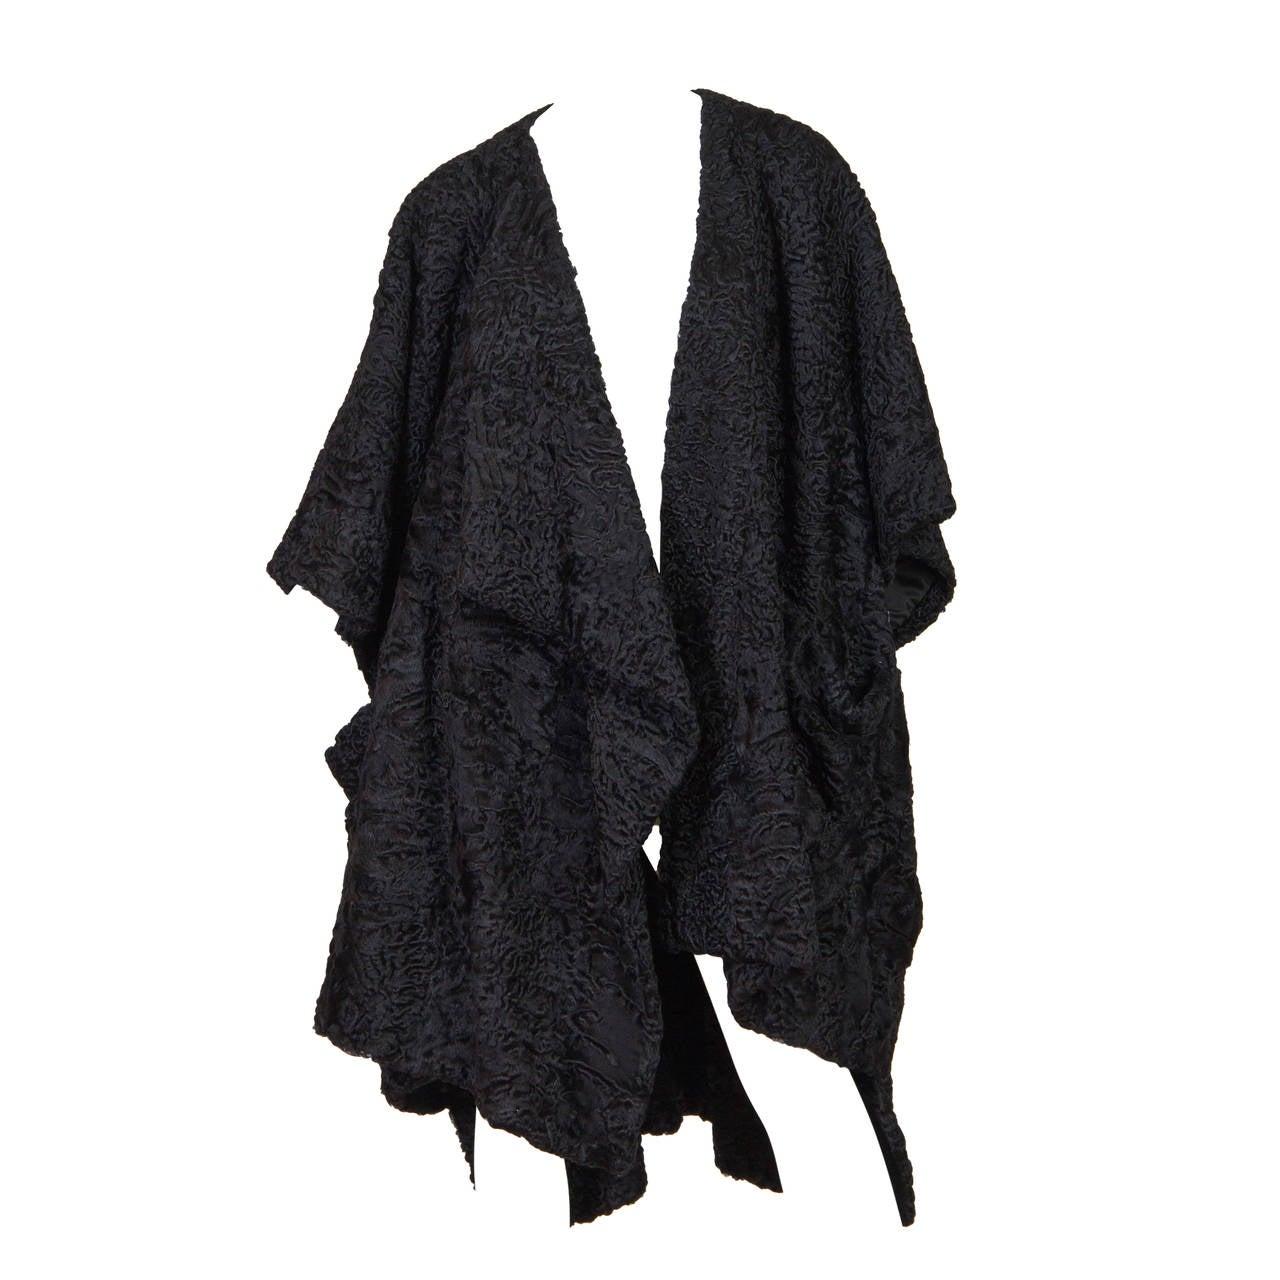 Patrick Kelly Asymetrical Minimalist Black Astrakhan Fur Coat 1